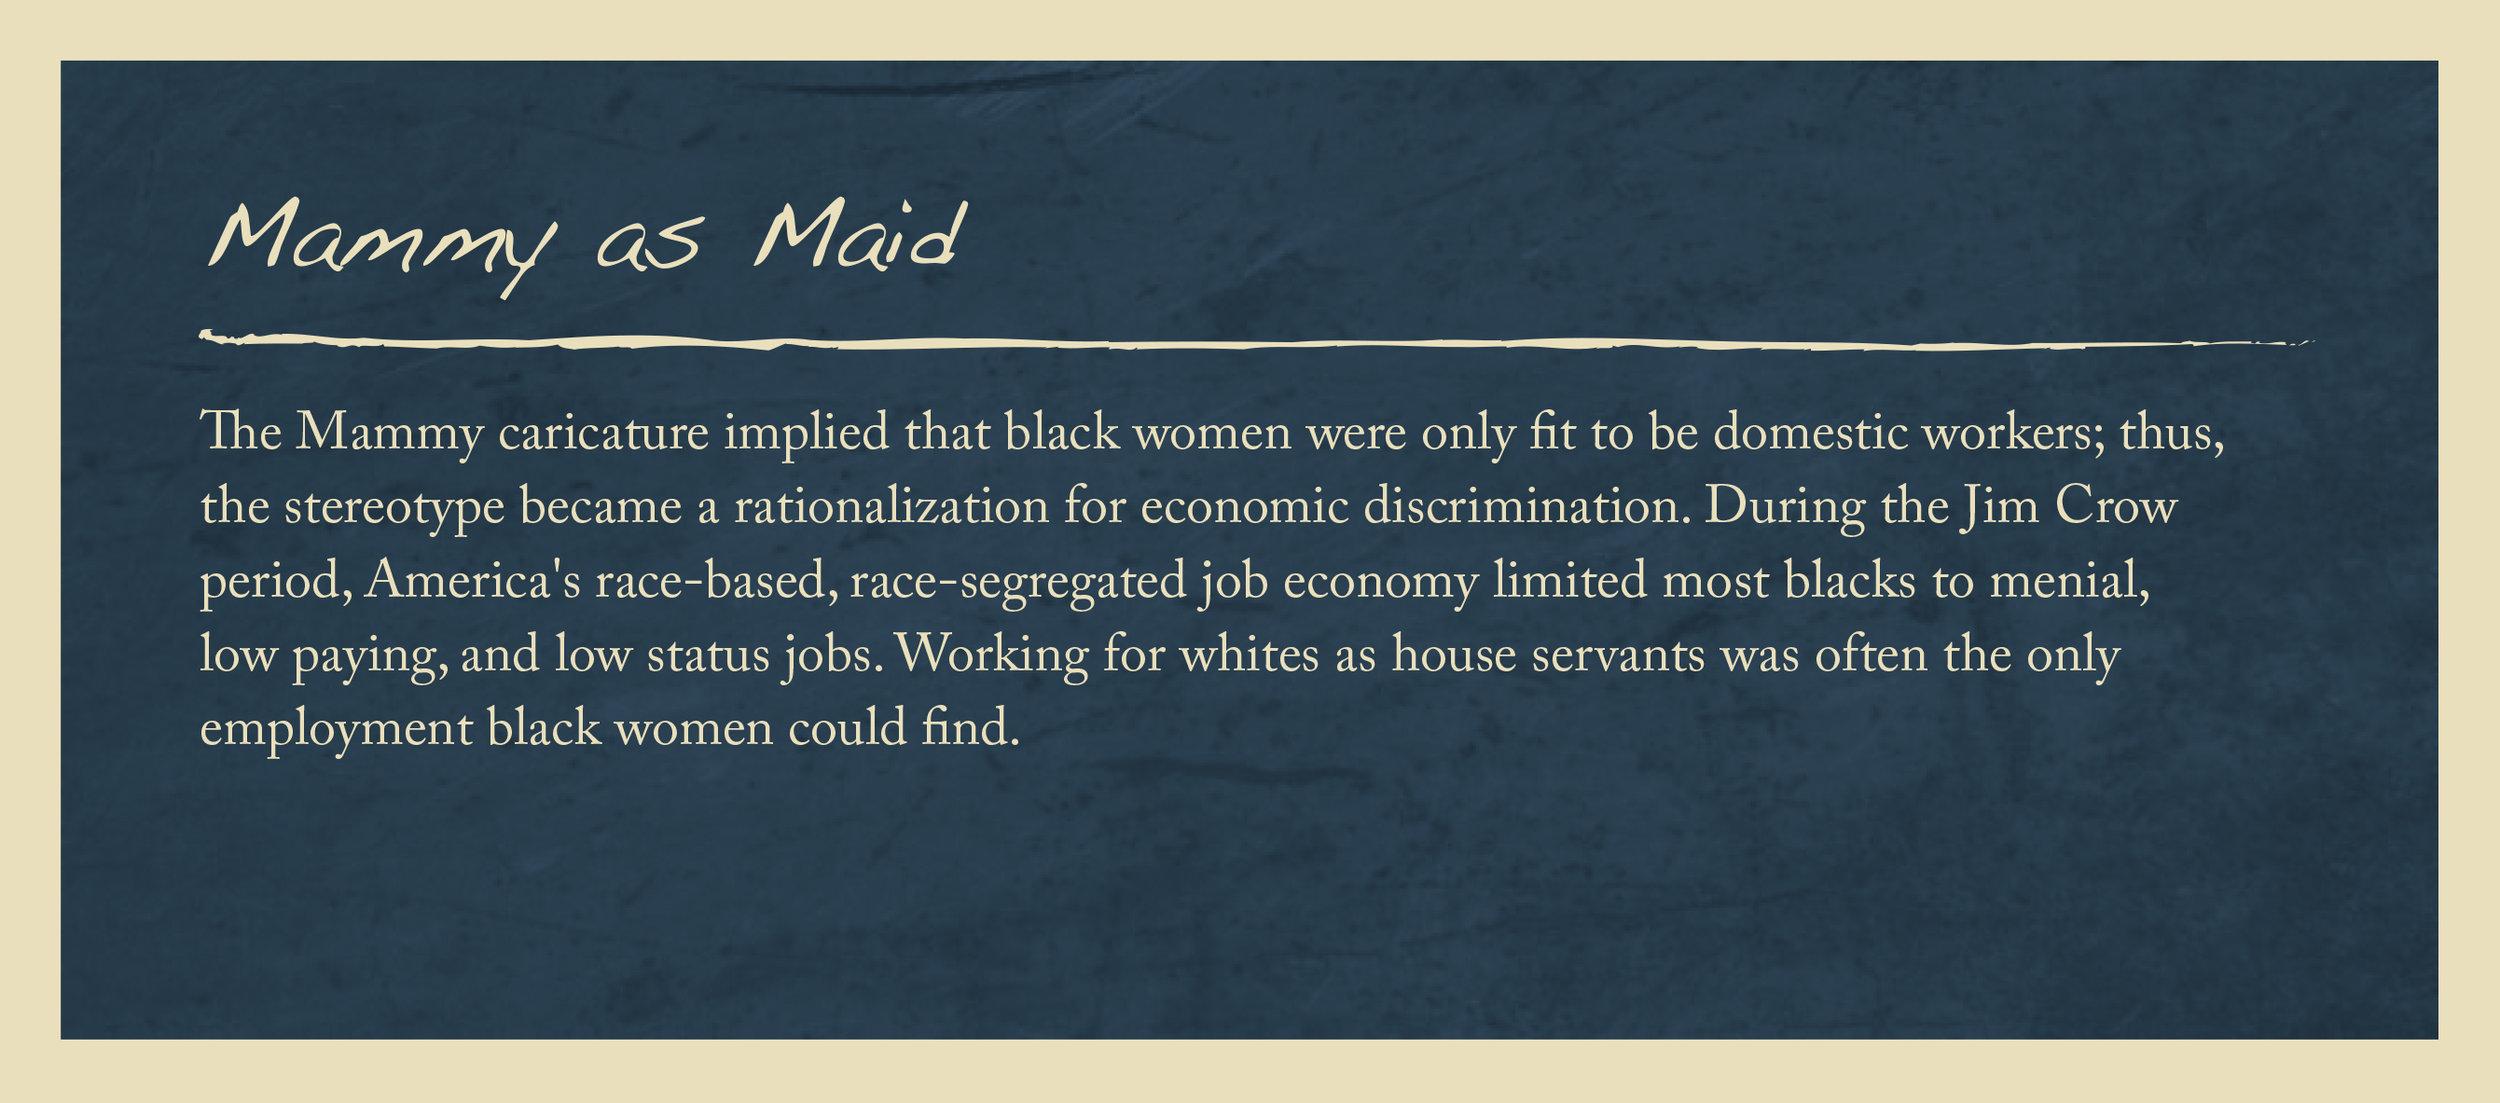 Mammy as Maid.jpg